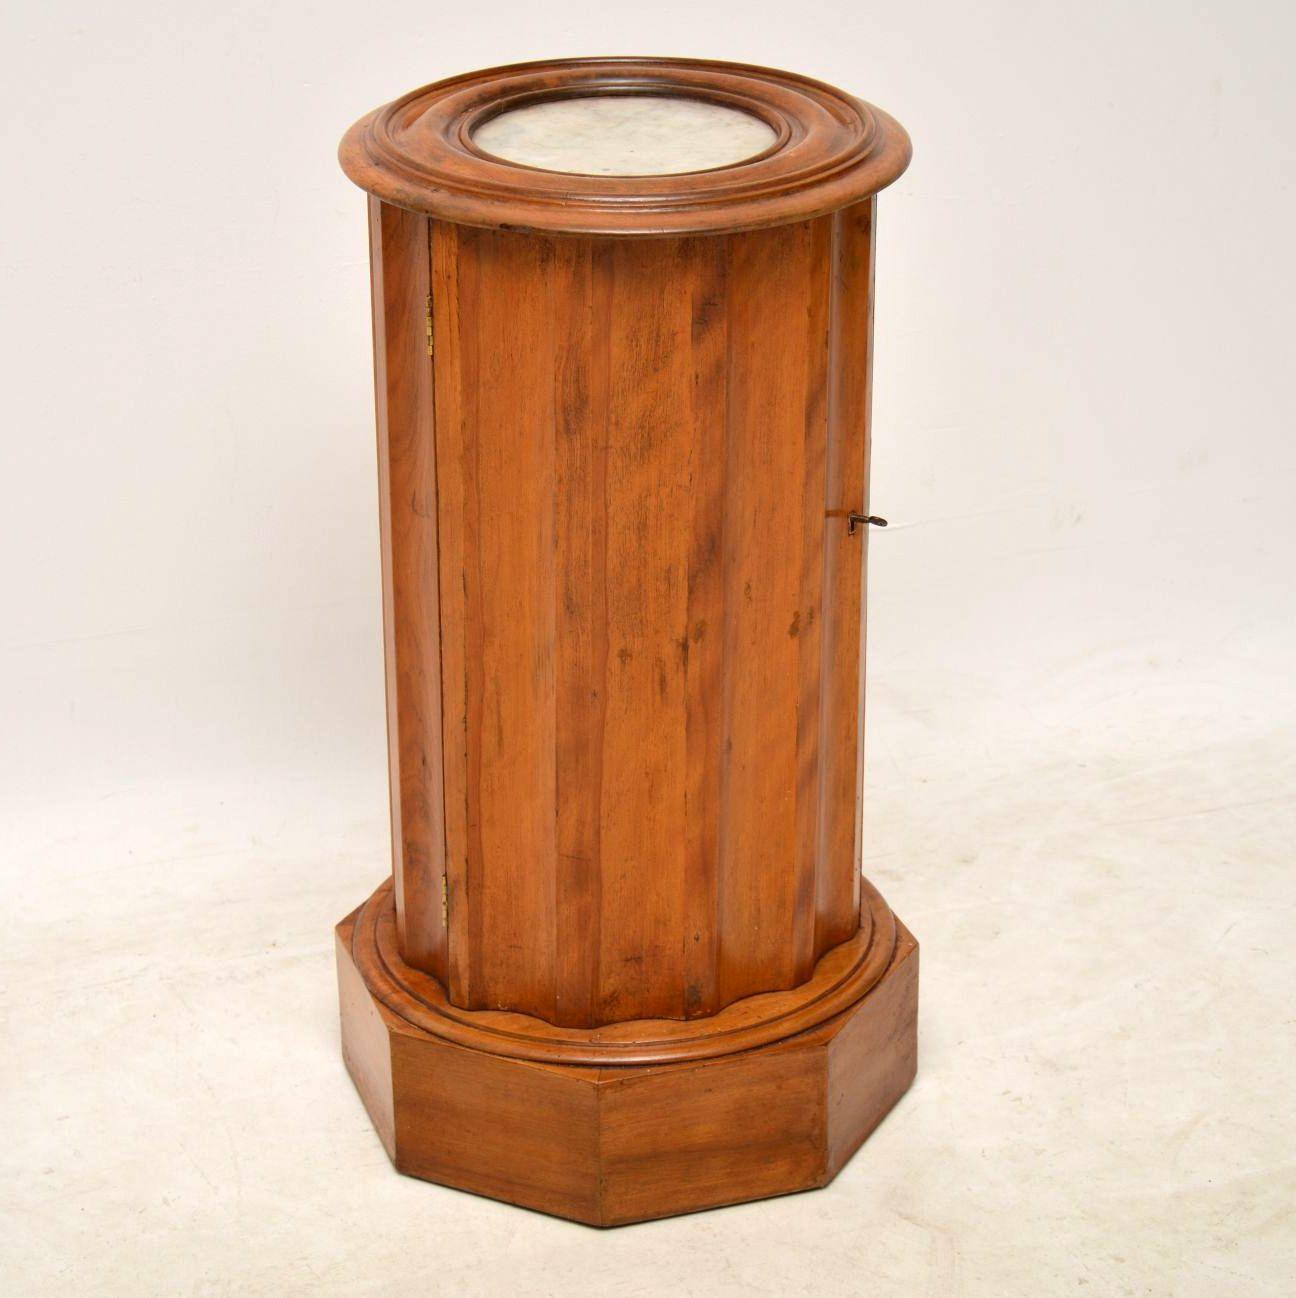 Antique Victorian Satin Wood Marble Top Pot Cupboard - Antique Victorian Satin Wood Marble Top Pot Cupboard Interior